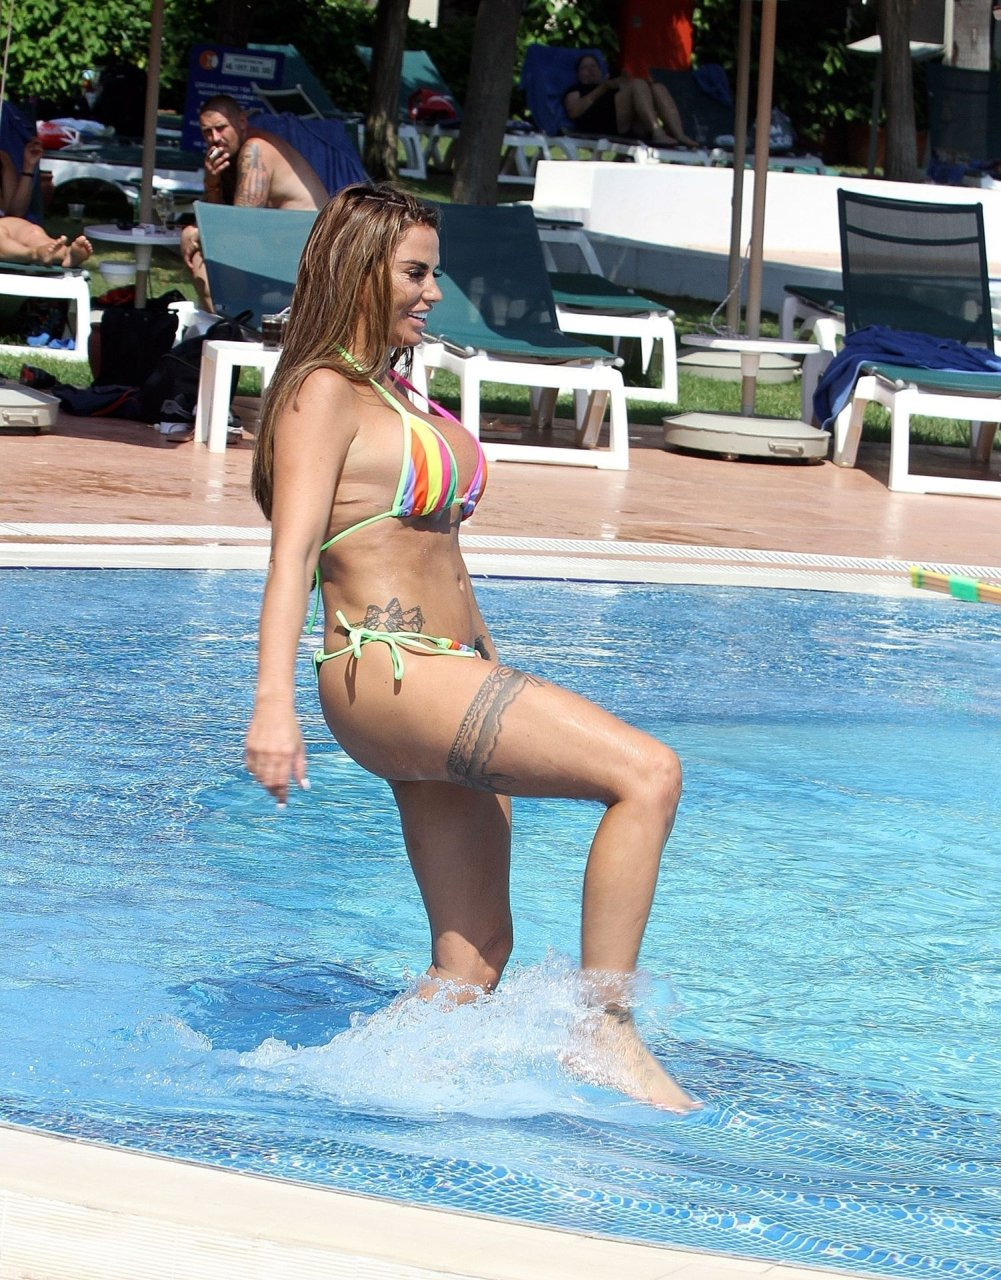 Katie-Price-Nude-Sexy-TheFappeningBlog.com-16.jpg